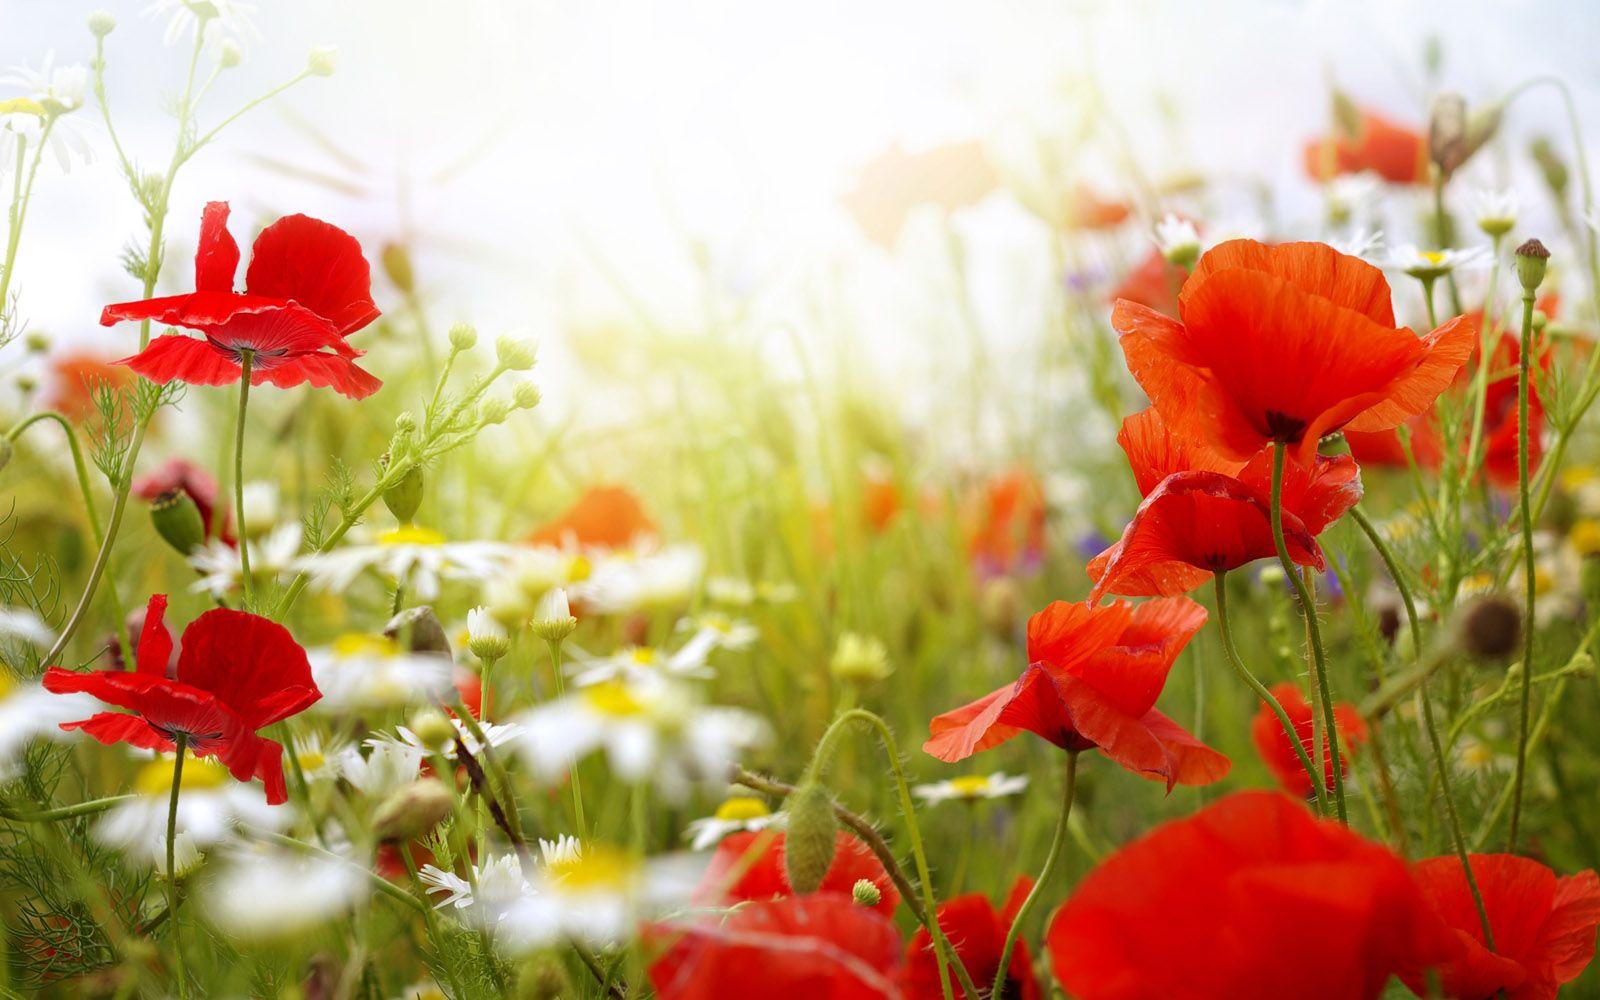 Spring Spring Flowers Wallpaper Hd Desktop Widescreen For